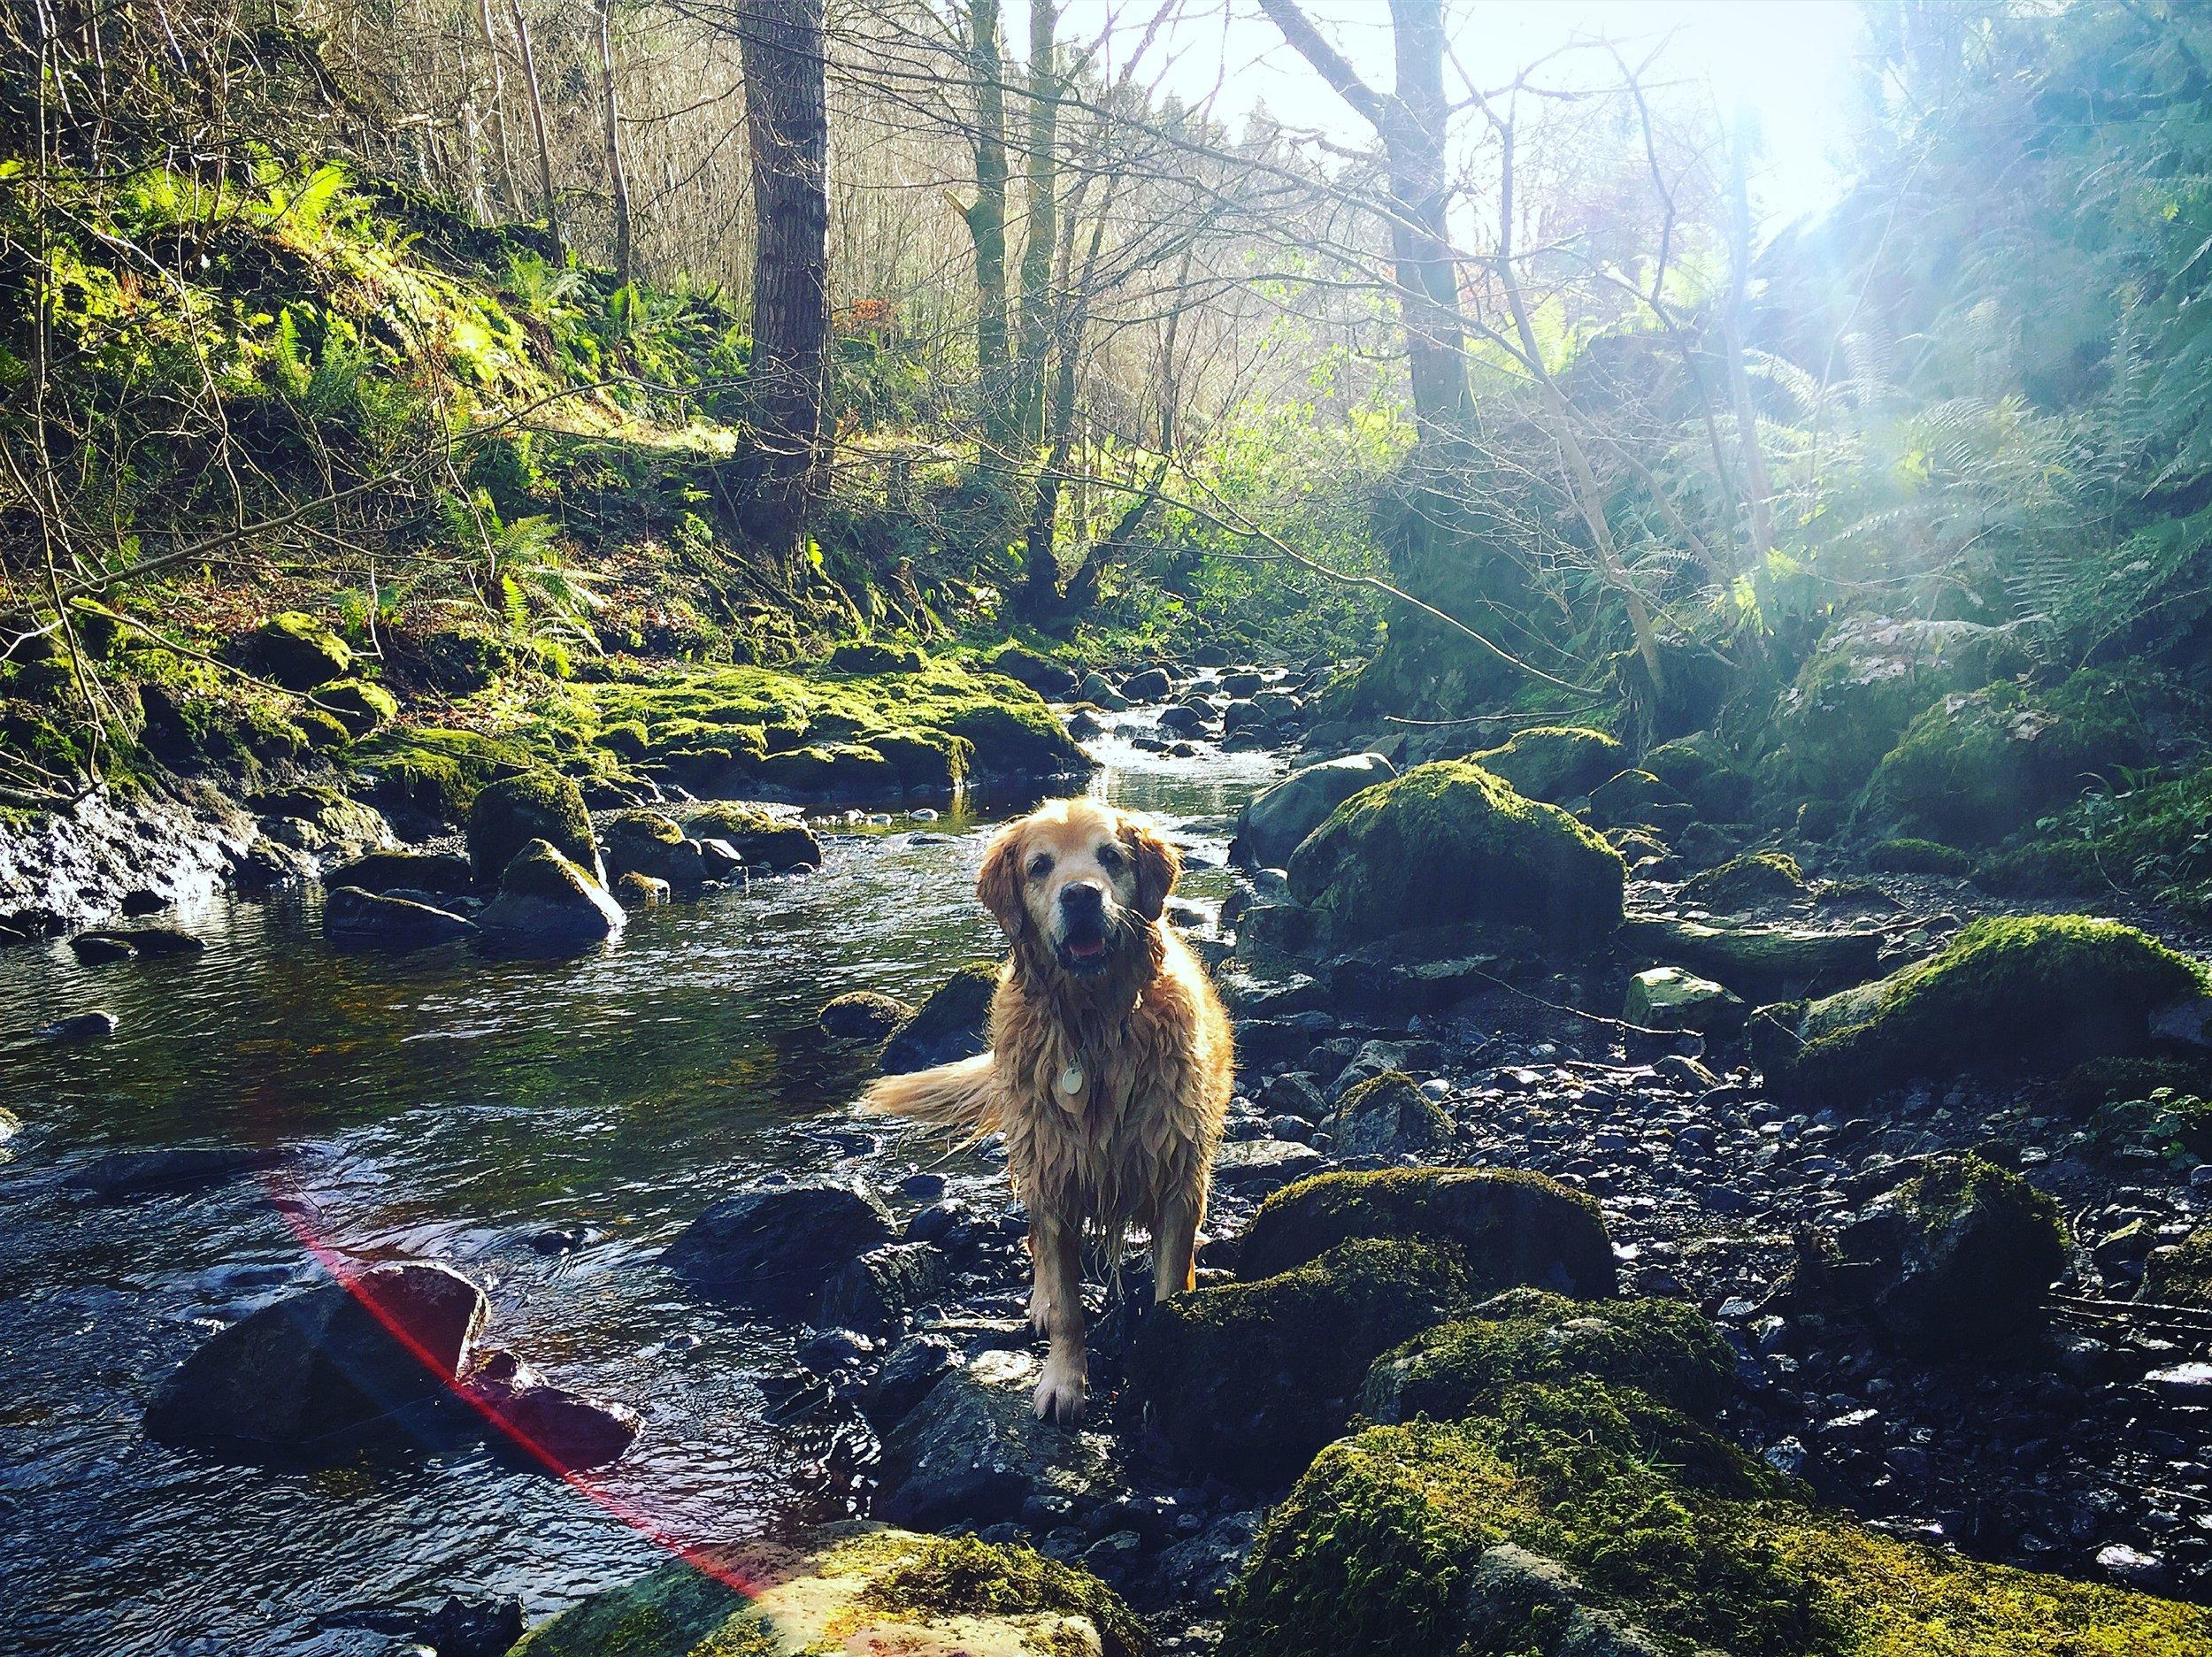 river_forest_golden_retriever_glenariff_glenoe_glenarm_glens_antrim_ni_explorer_niexplorer_northern_ireland_blog.jpg